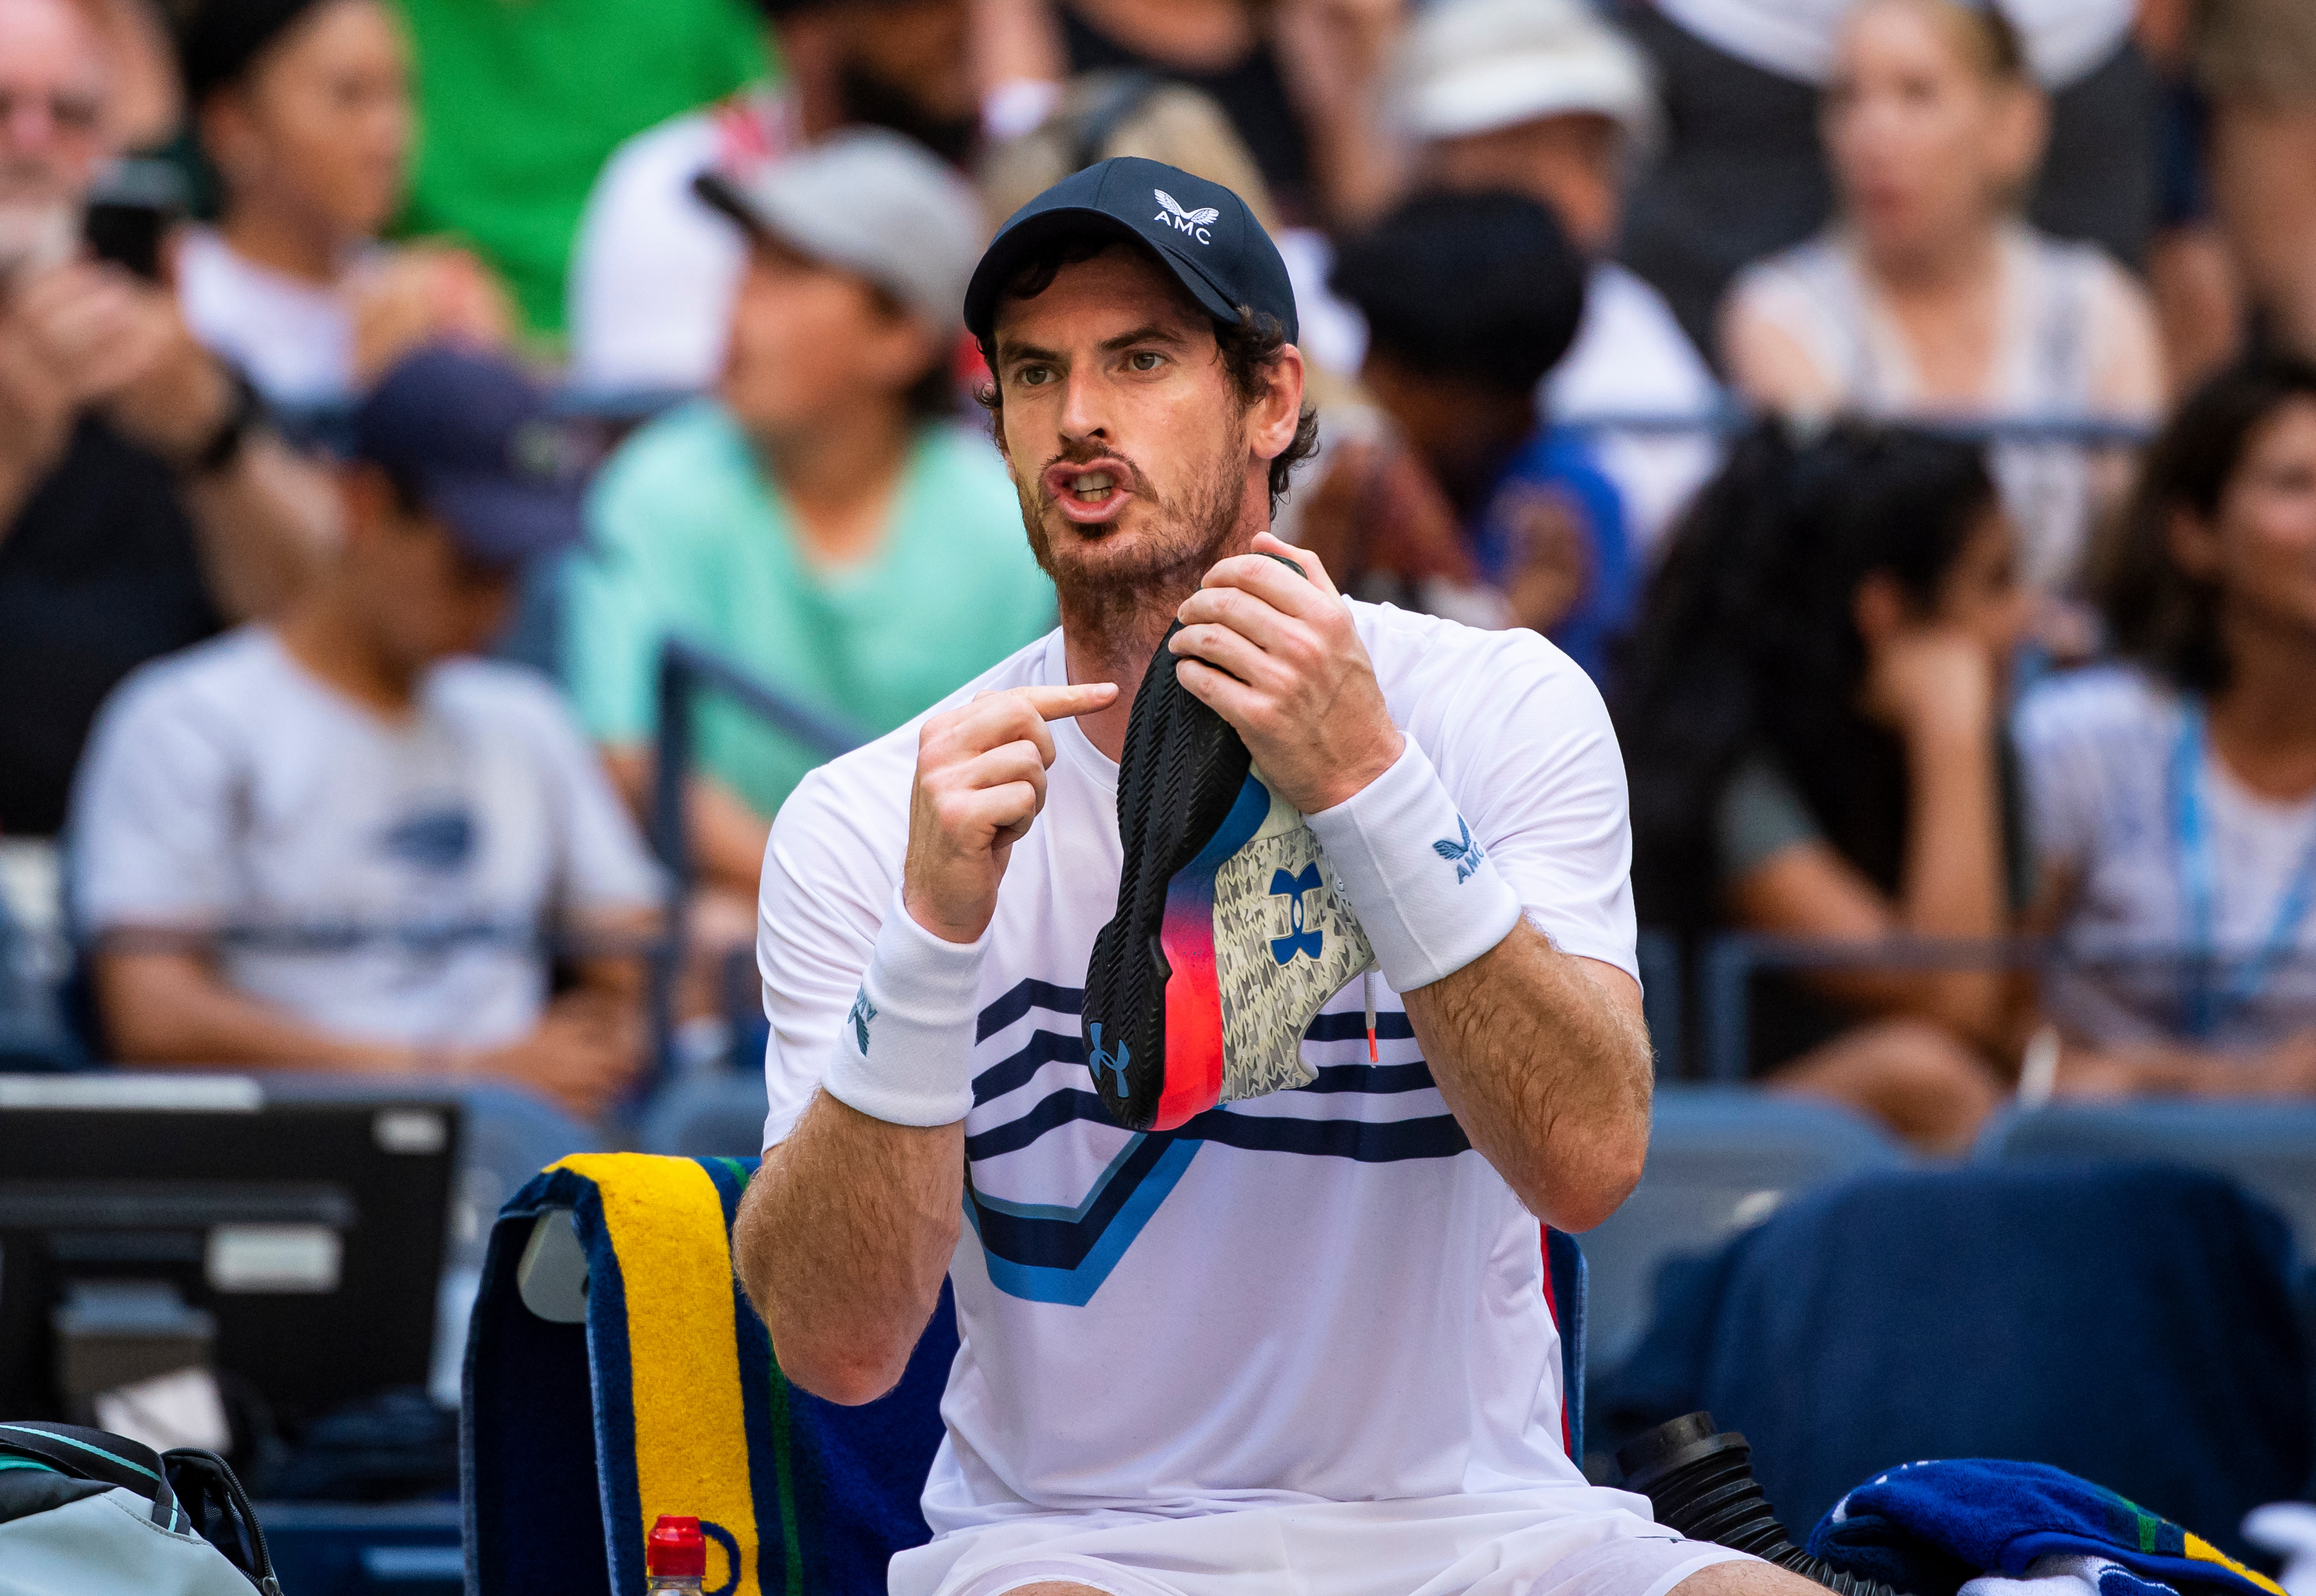 Andy Murray takes aim at Tsitsipas again as toilet break row rolls on